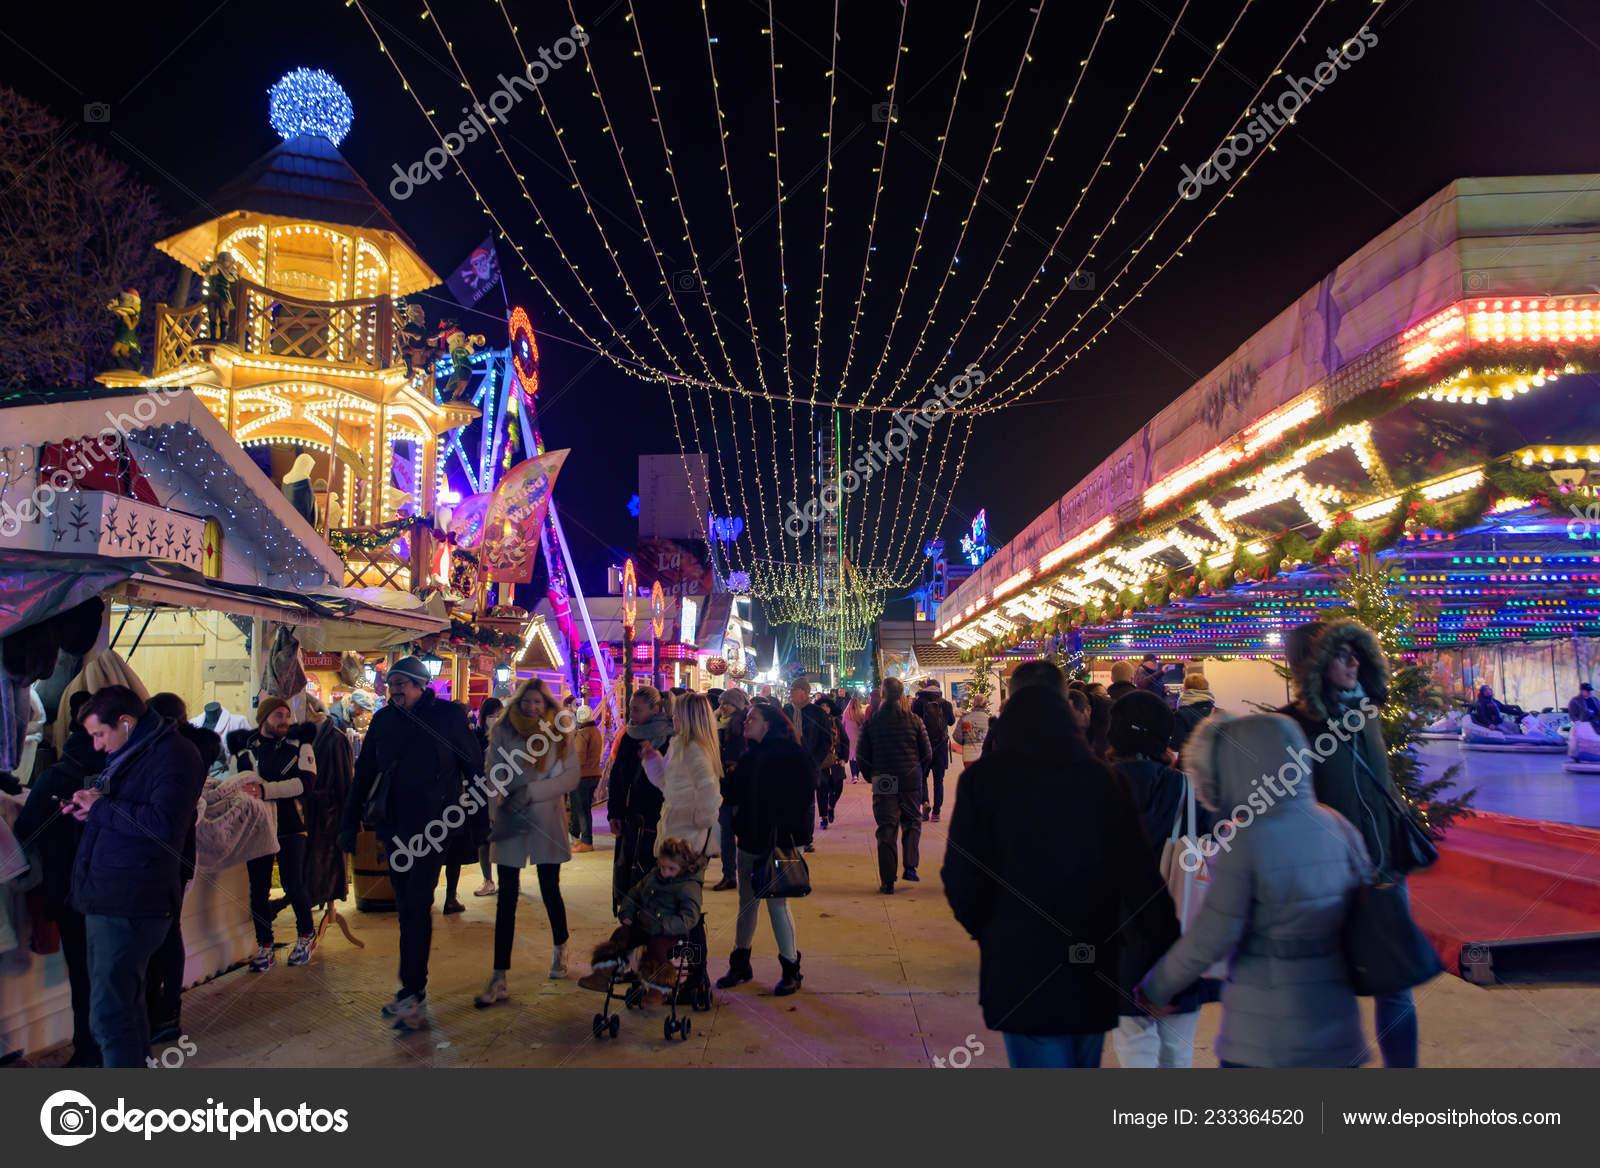 2018 Christmas Market Tuileries Gardens Paris France Stock